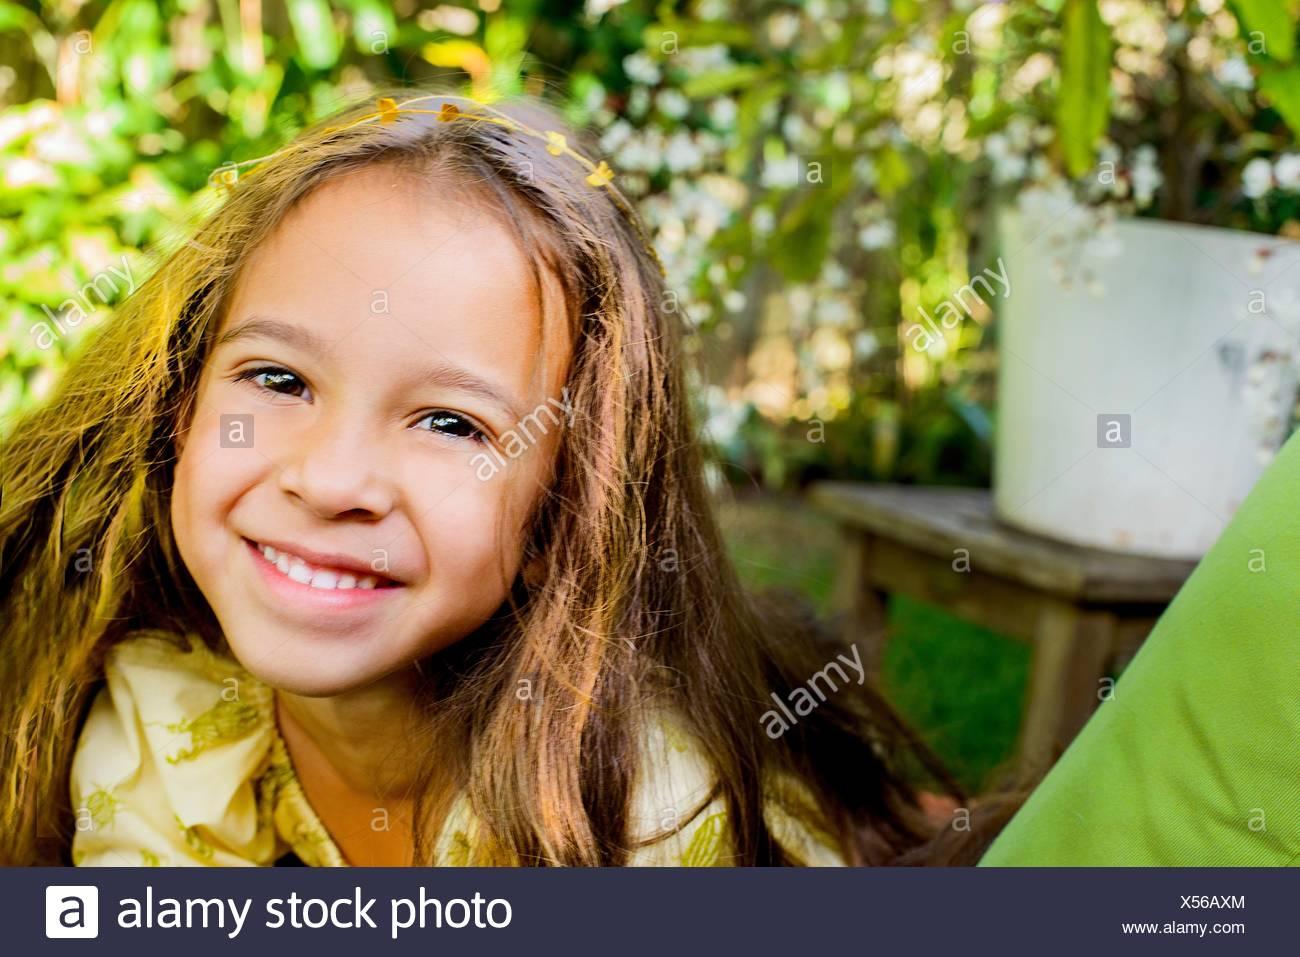 Portrait of pretty smiling girl in garden - Stock Image